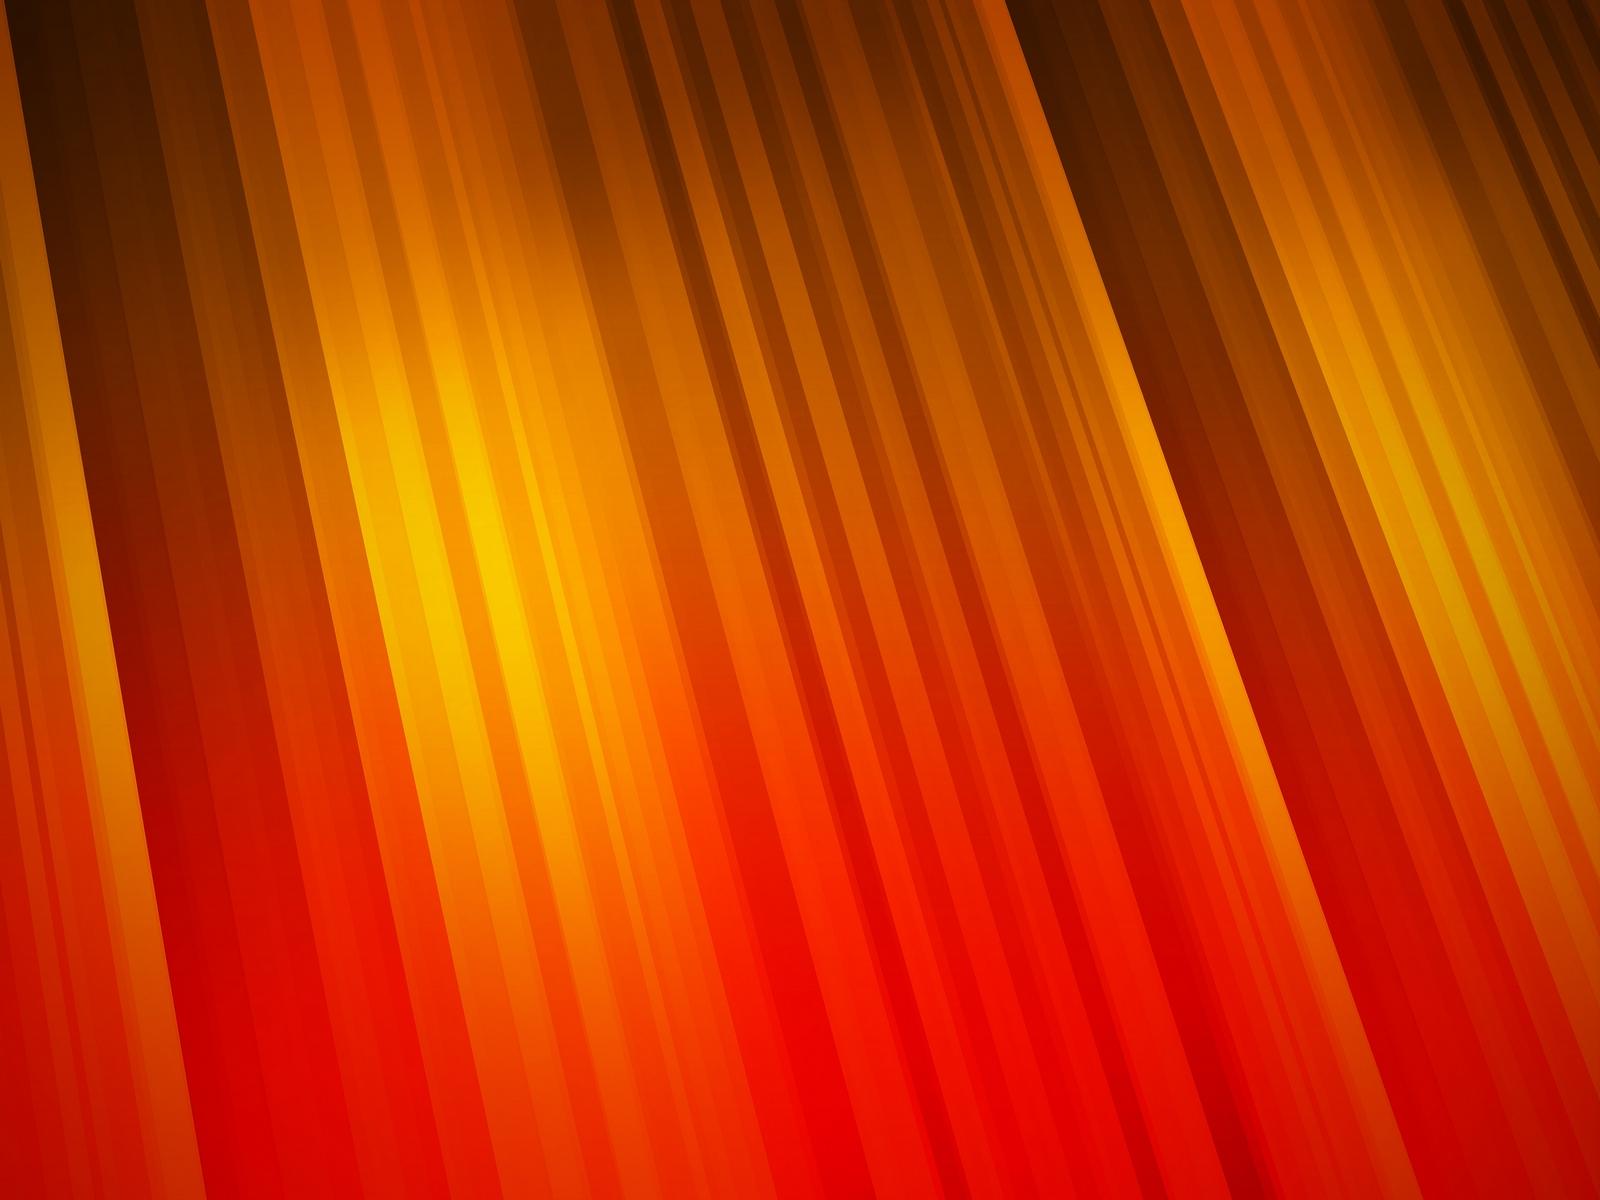 Orange wallpaper   Orange Wallpaper 23886950 1600x1200